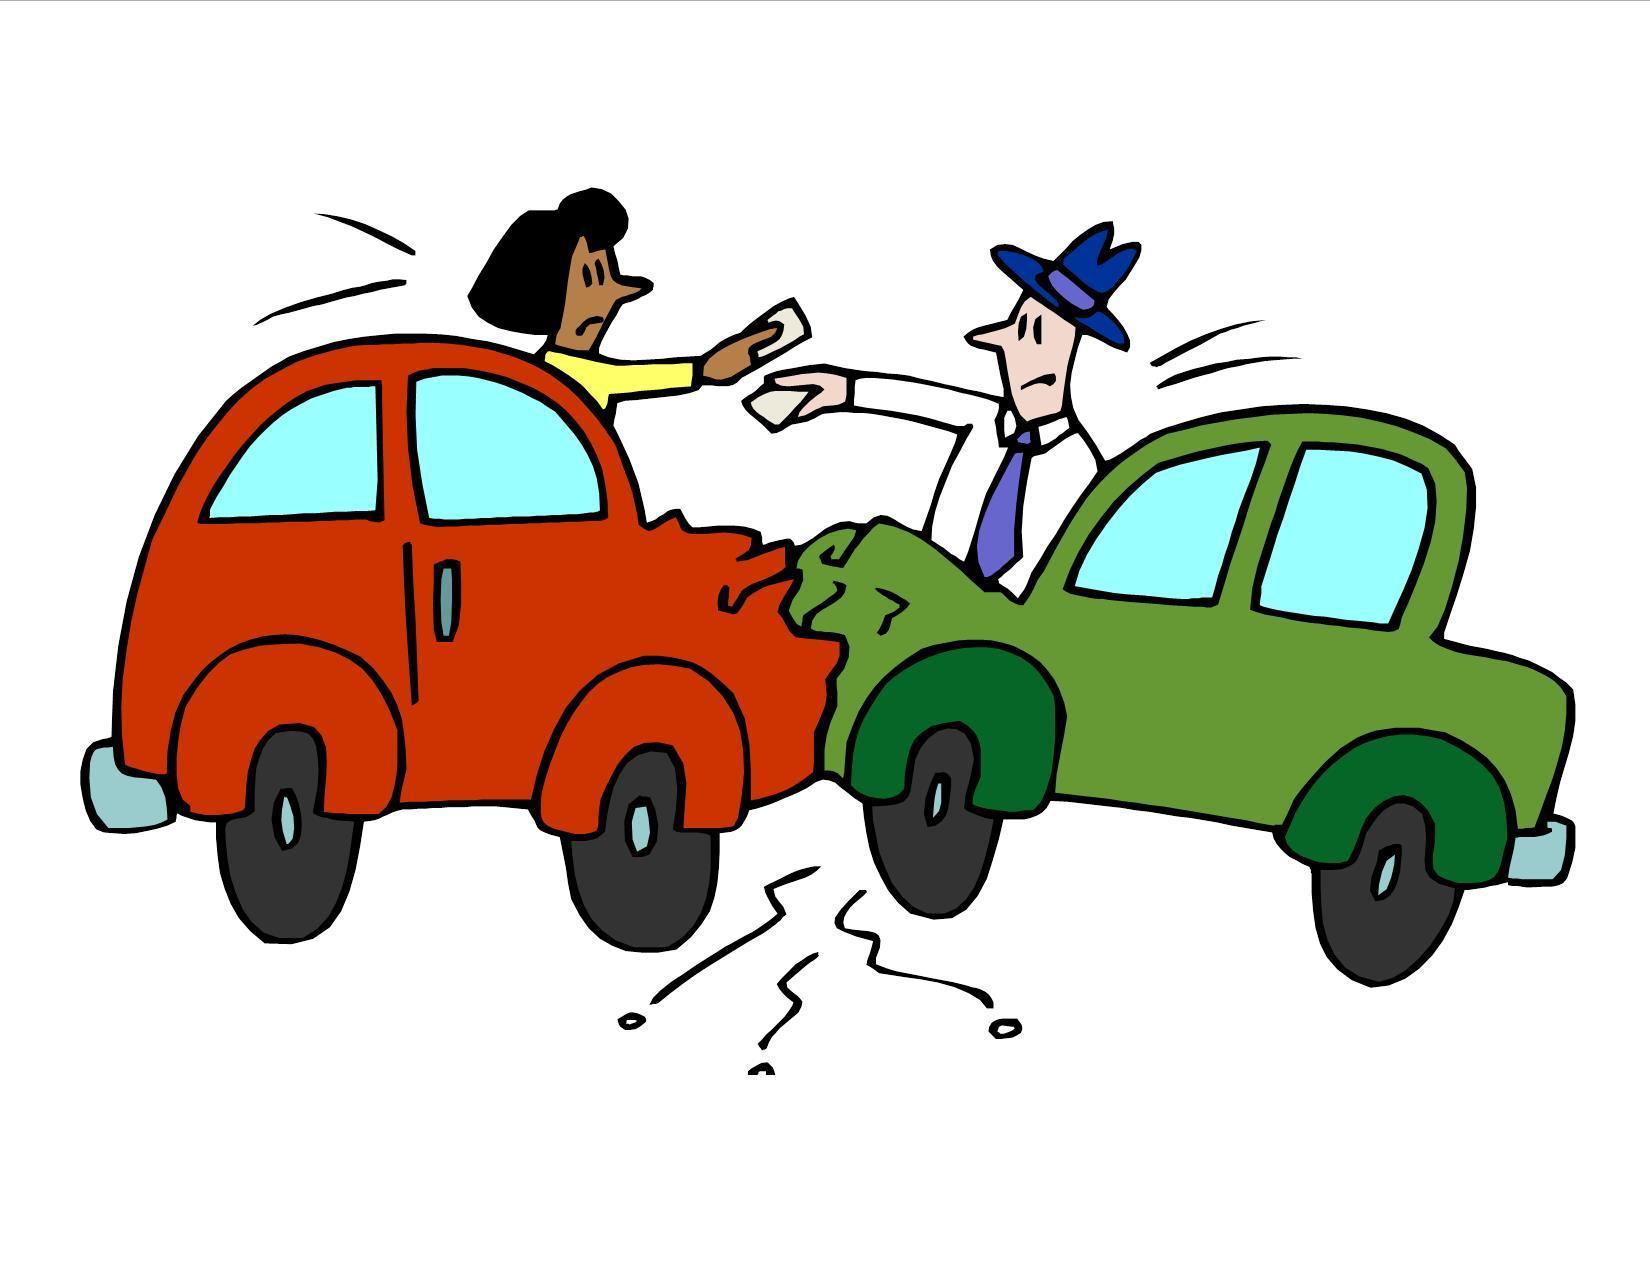 Car accident clipart free 5 » Clipart Portal.